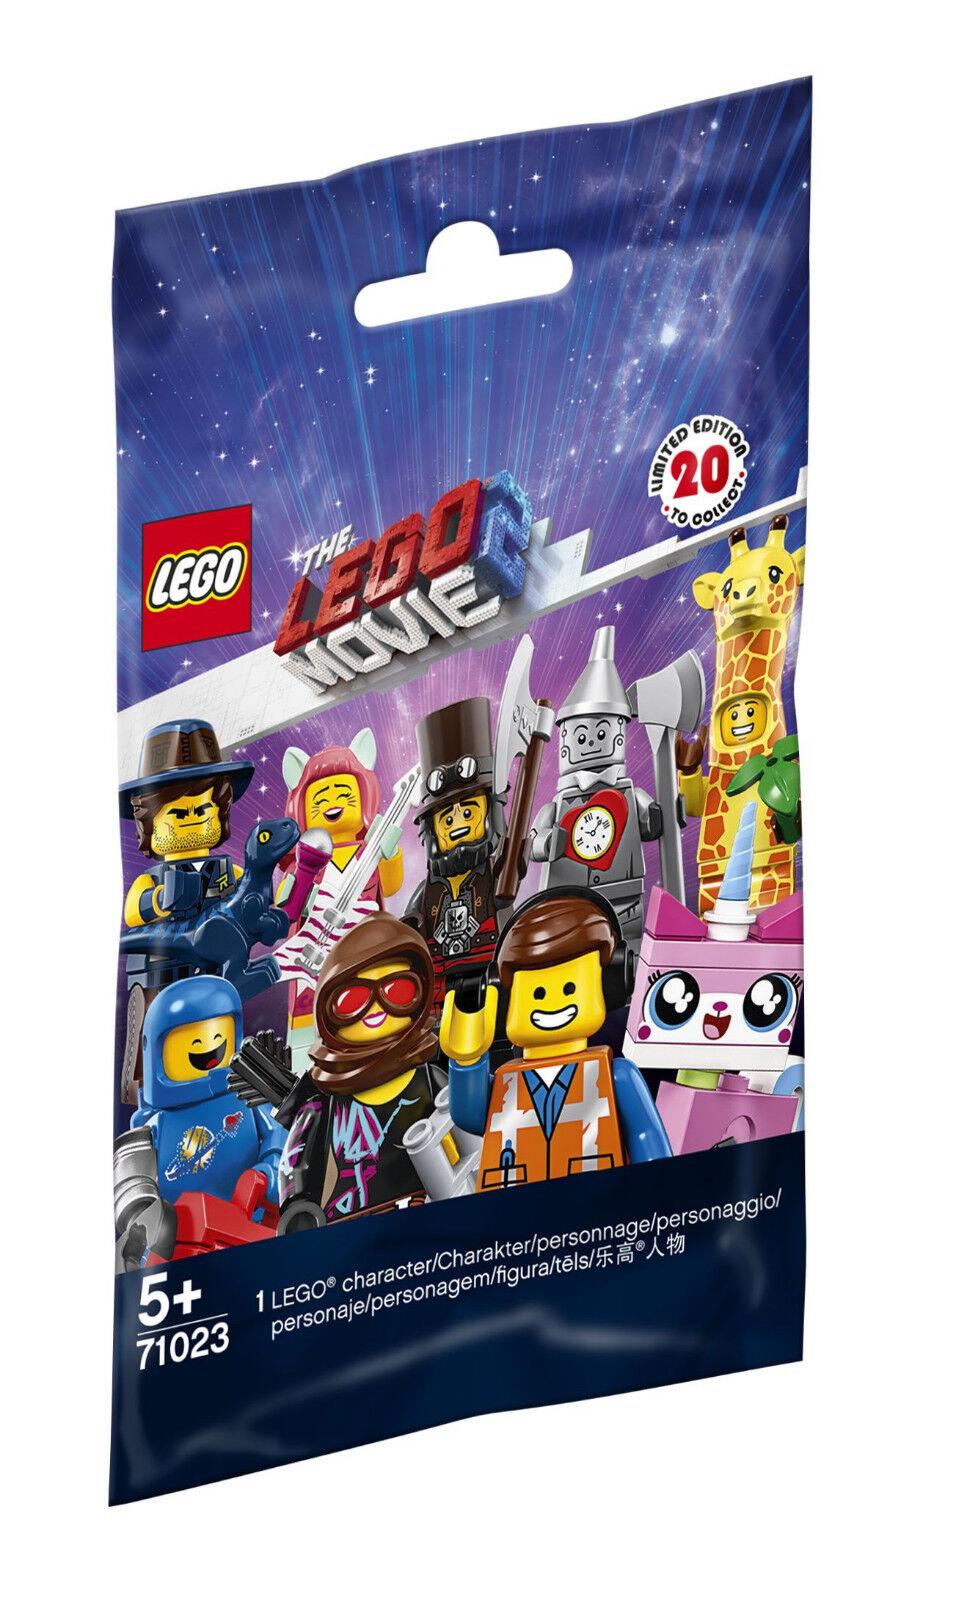 LEGO 71023 The Lego Movie 2 - Komplettsatz Komplettsatz Komplettsatz mit allen 20 Minifiguren - Figur CMF 9b3df2